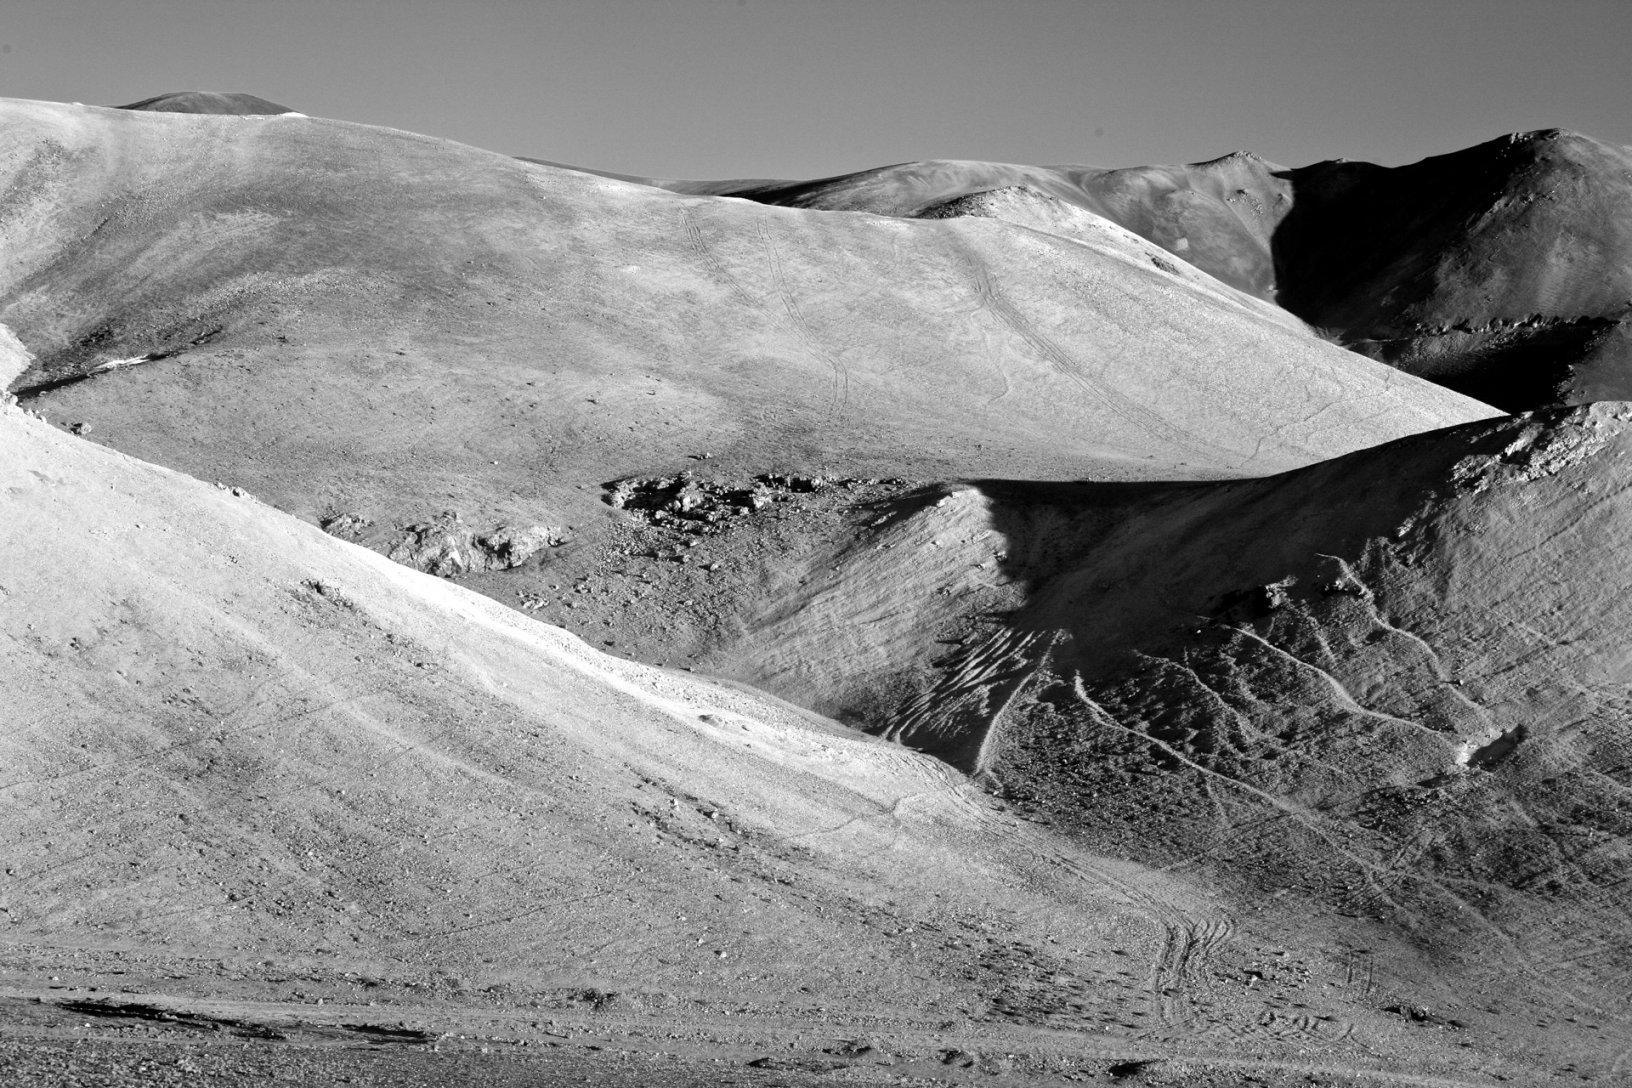 Atacama I (2015) - Pio Cabanillas Alonso